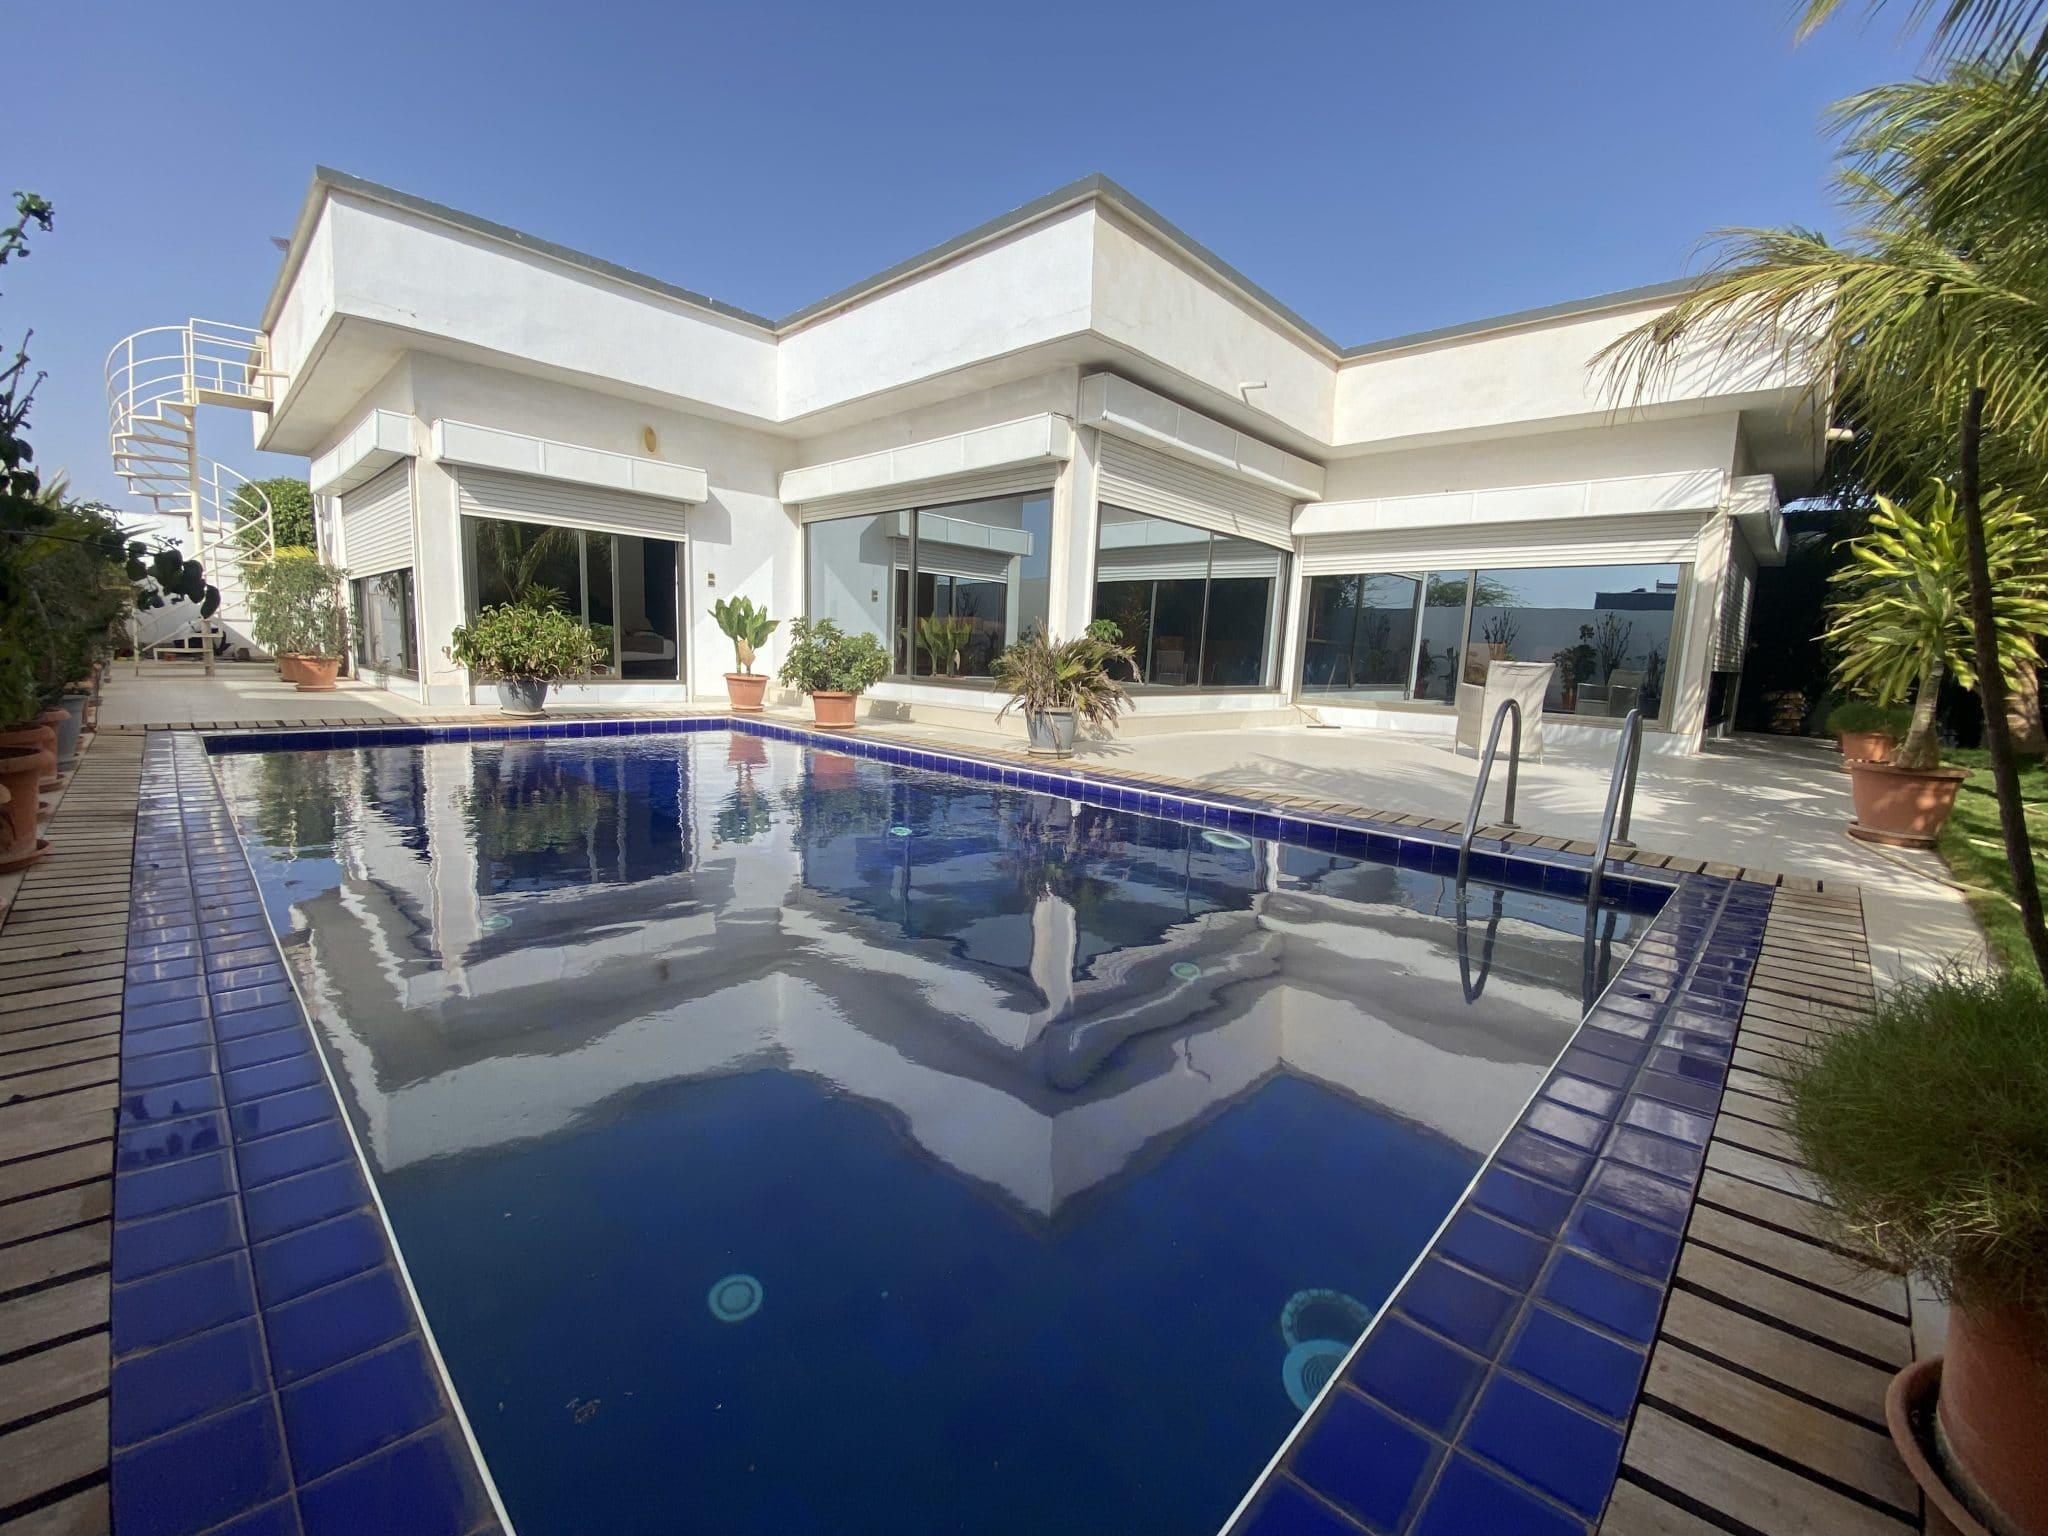 Belle résidence à vendre à Ndayane